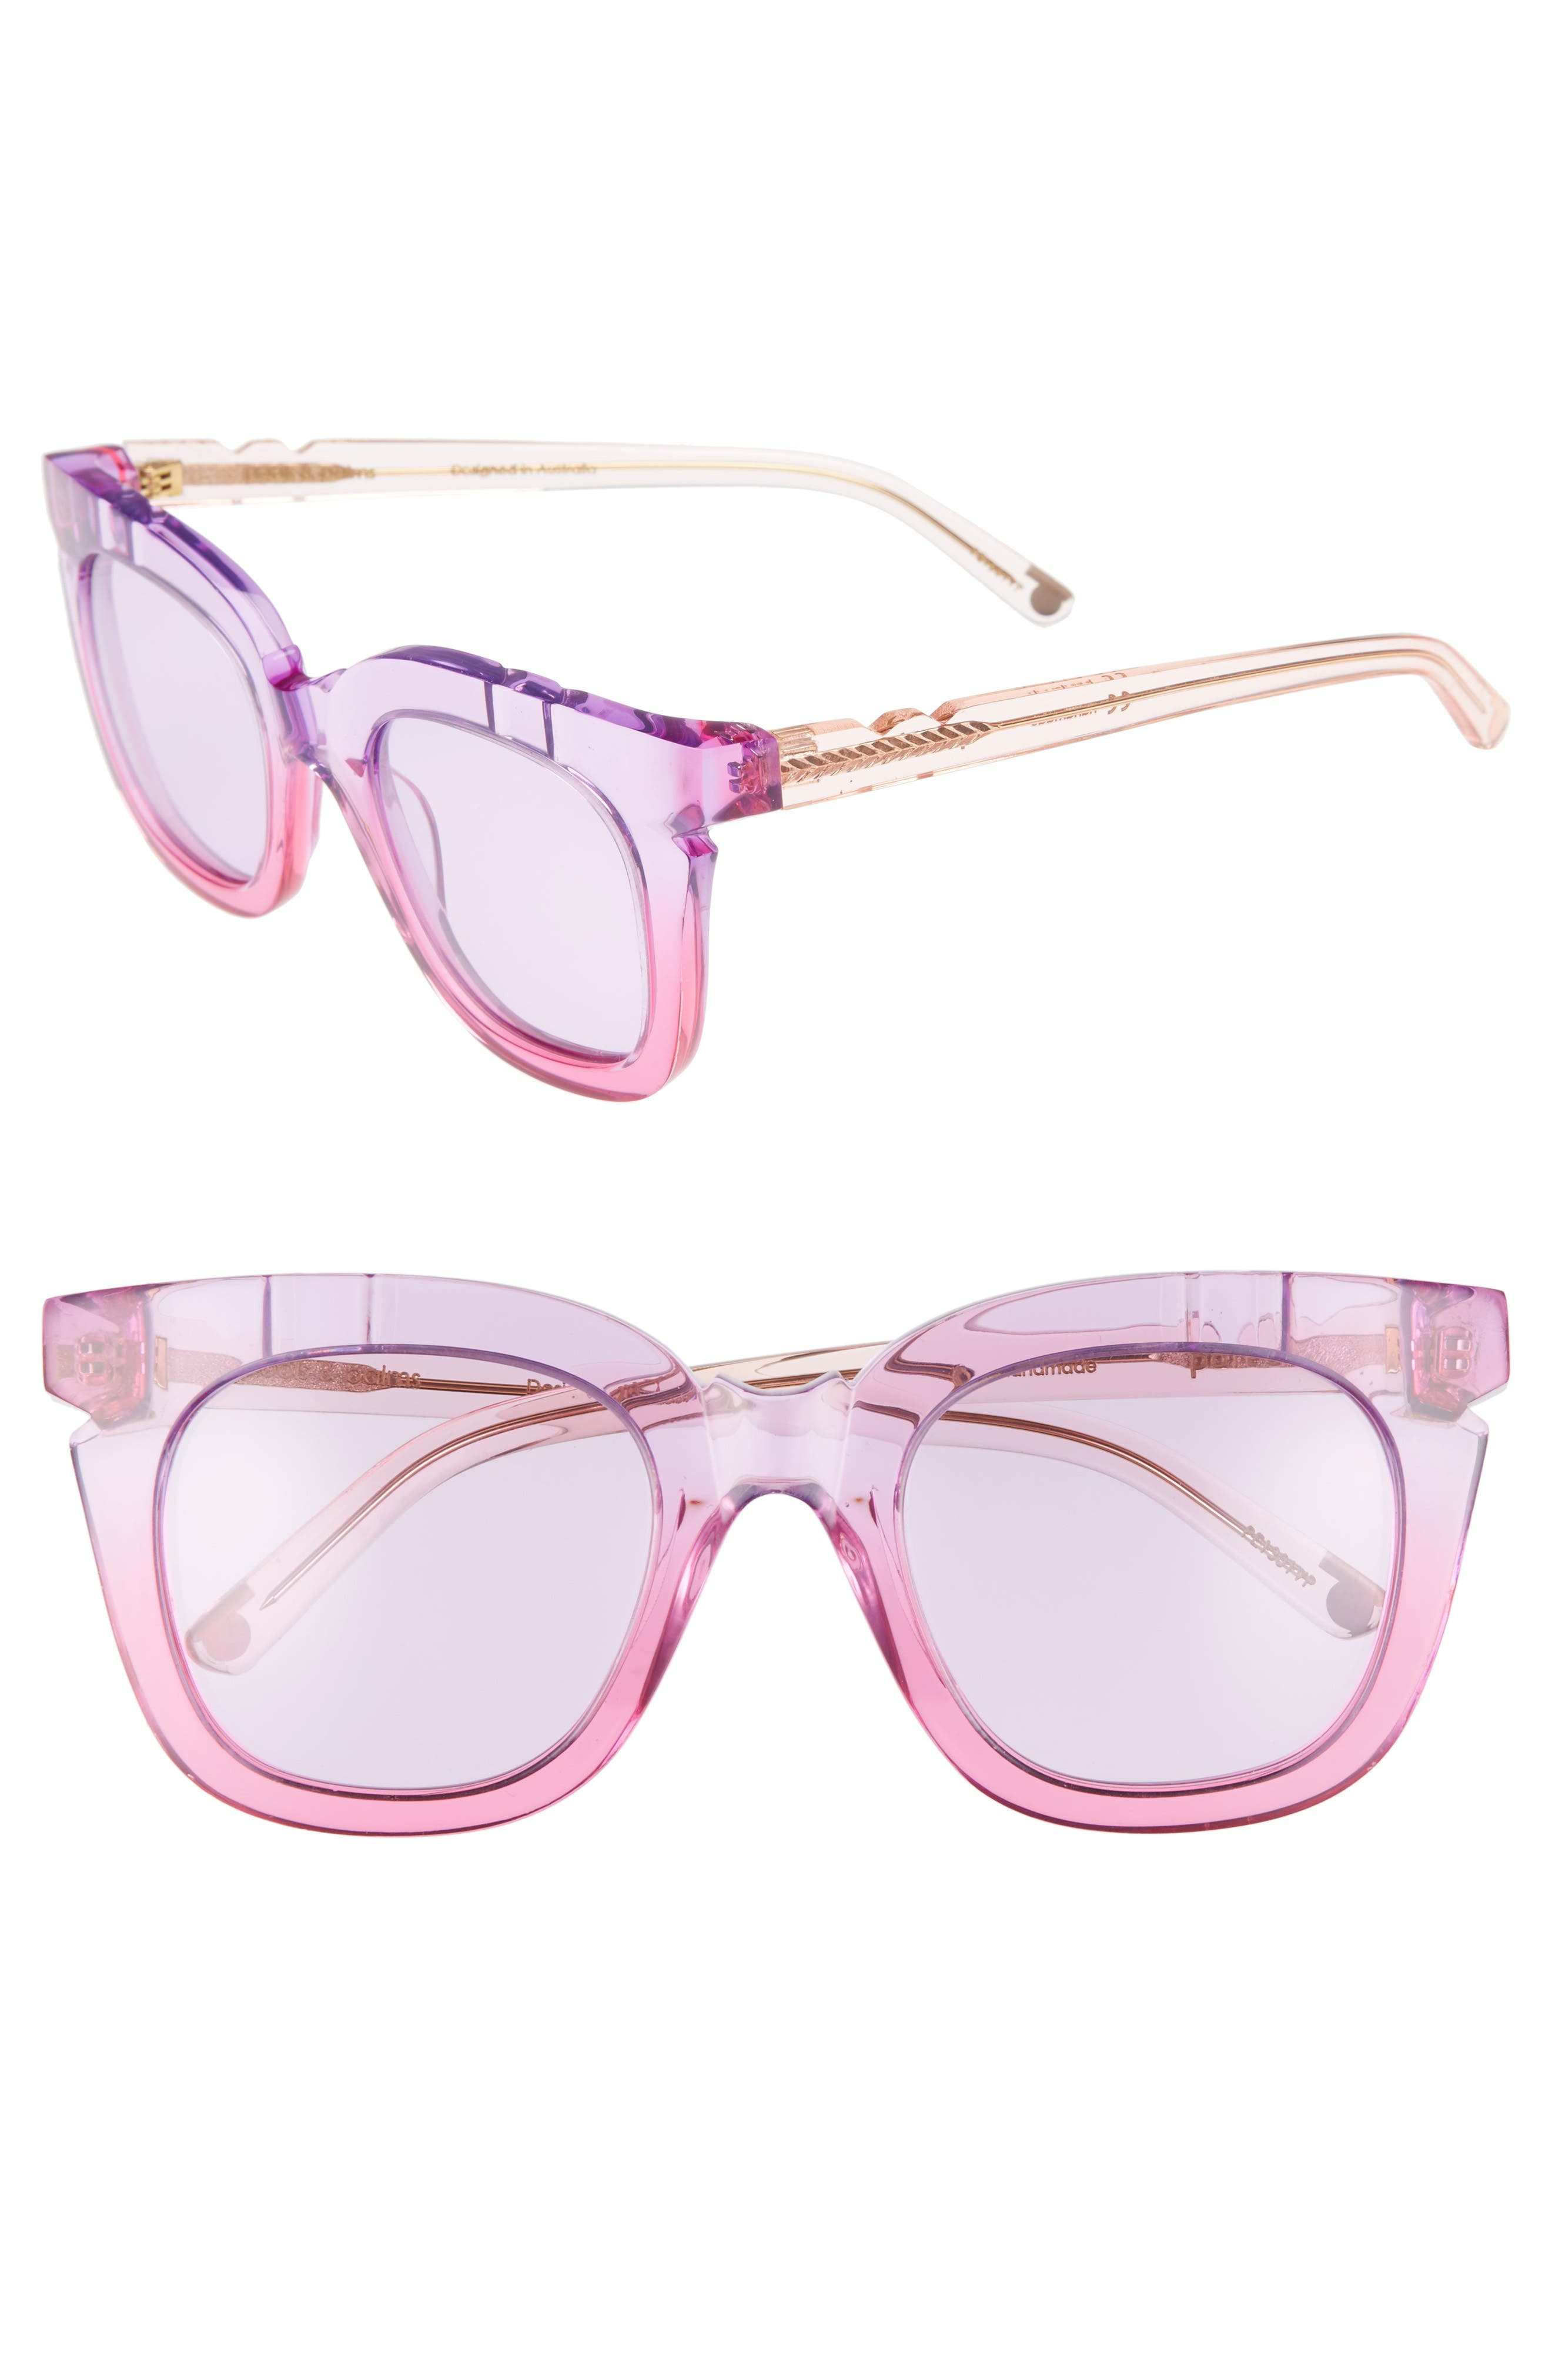 Pools & Palms 50mm Sunglasses,                             Main thumbnail 1, color,                             650